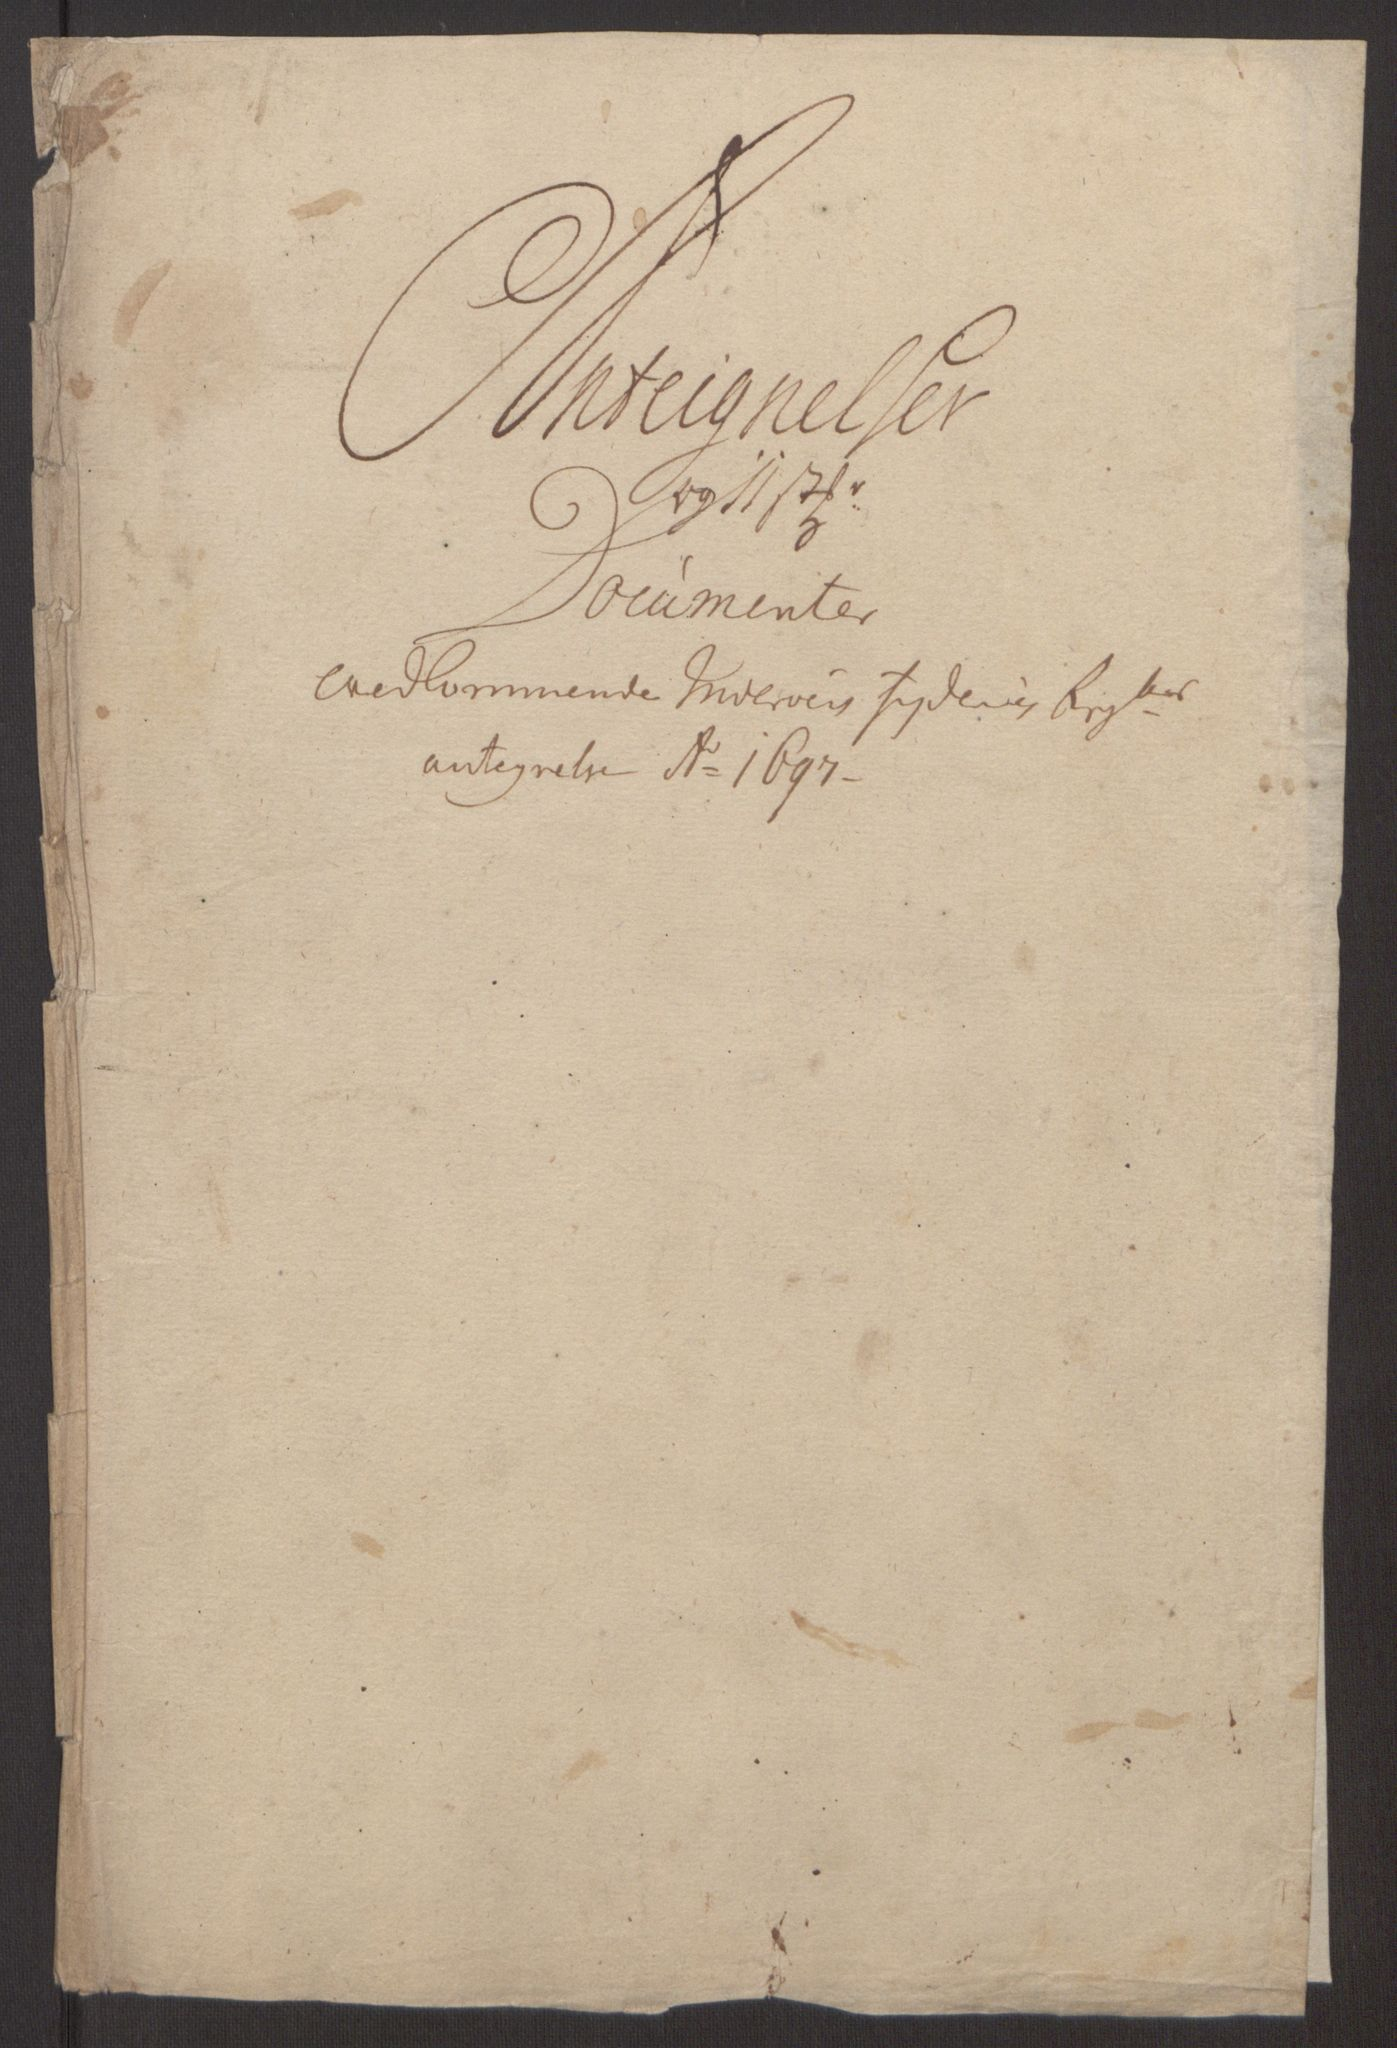 RA, Rentekammeret inntil 1814, Reviderte regnskaper, Fogderegnskap, R63/L4309: Fogderegnskap Inderøy, 1695-1697, s. 589